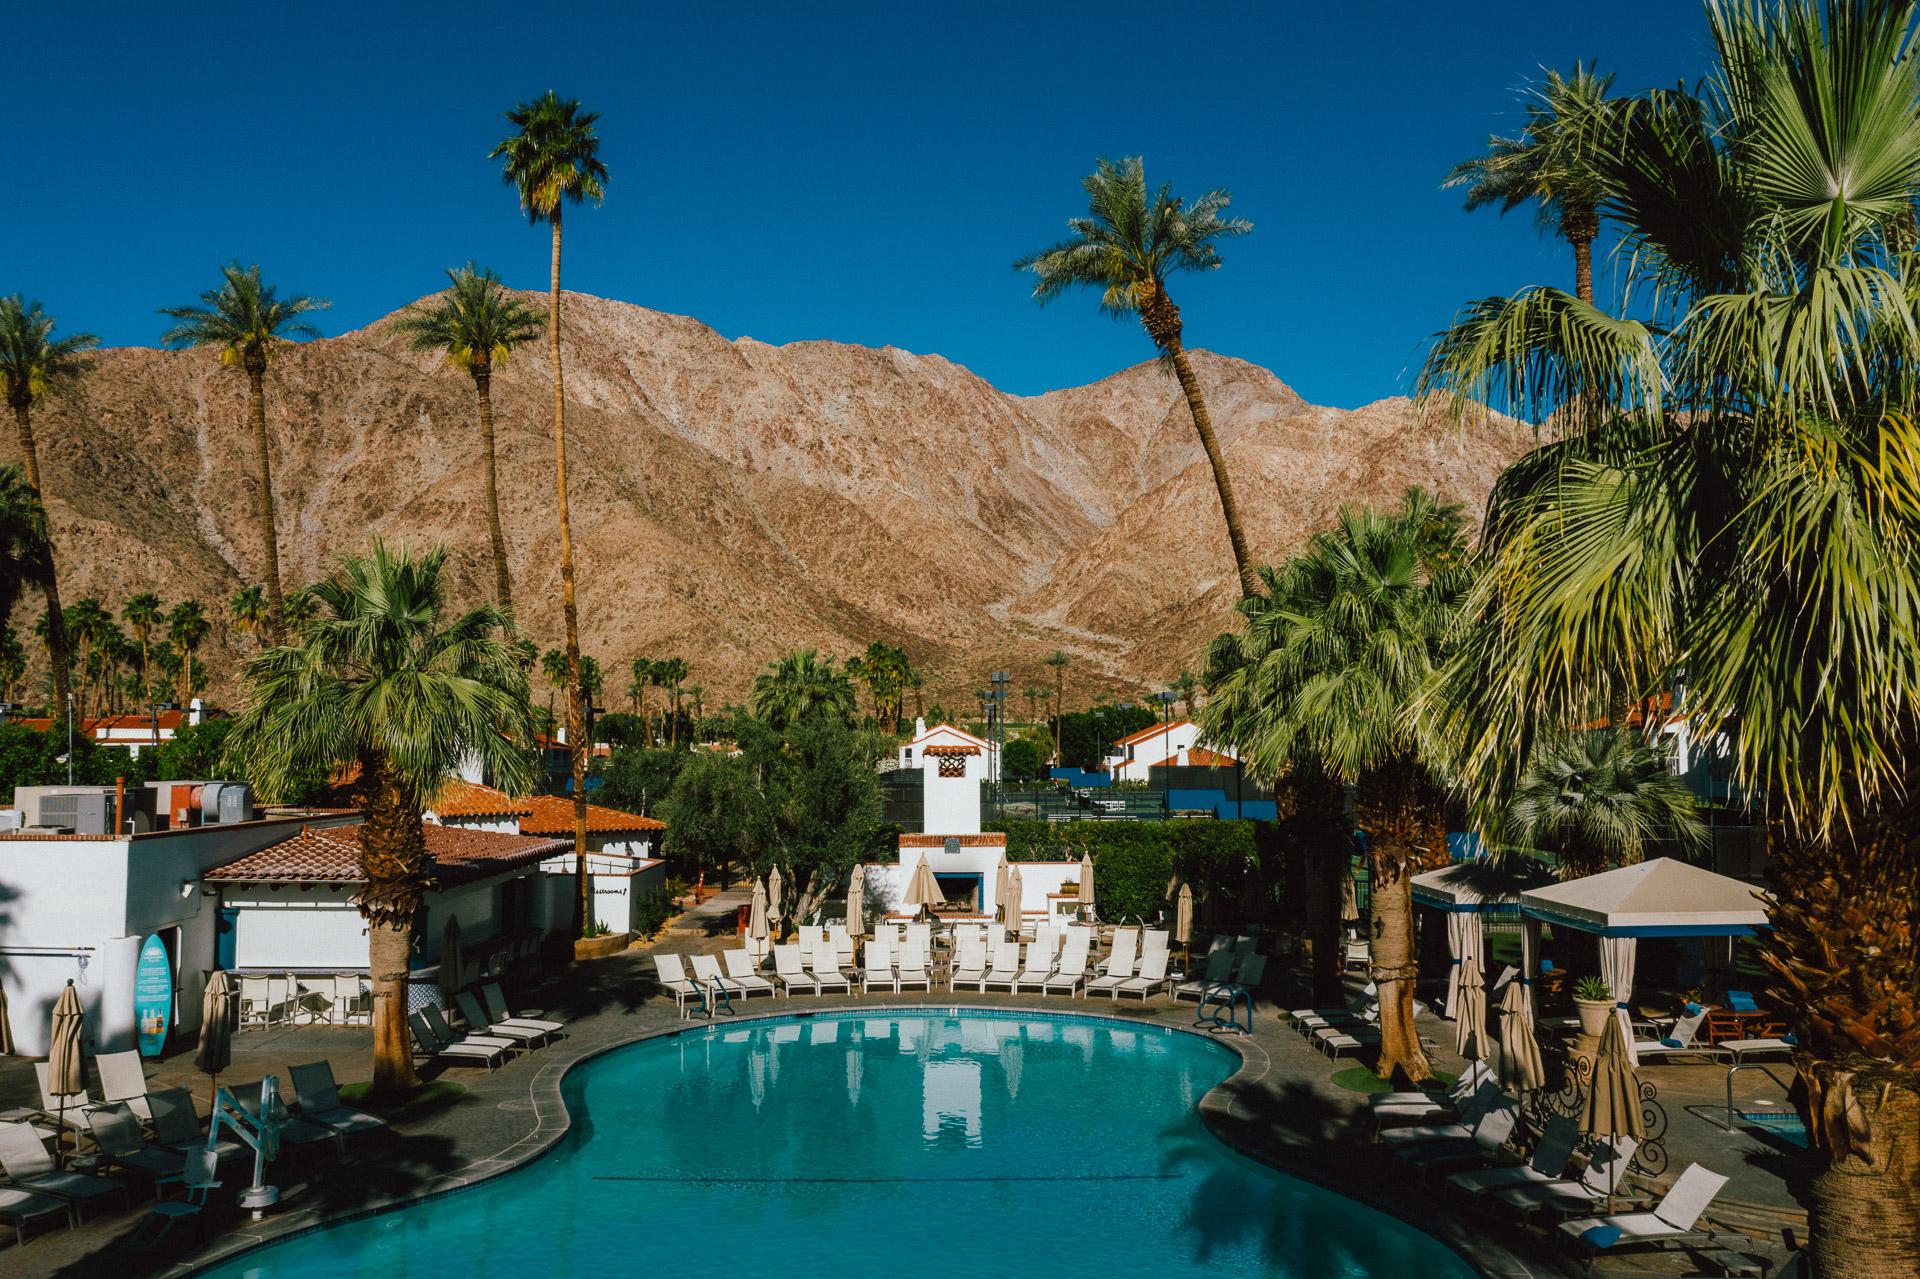 palm-springs-california-hotel-photographer-la-quinta-resort-club-5.jpg